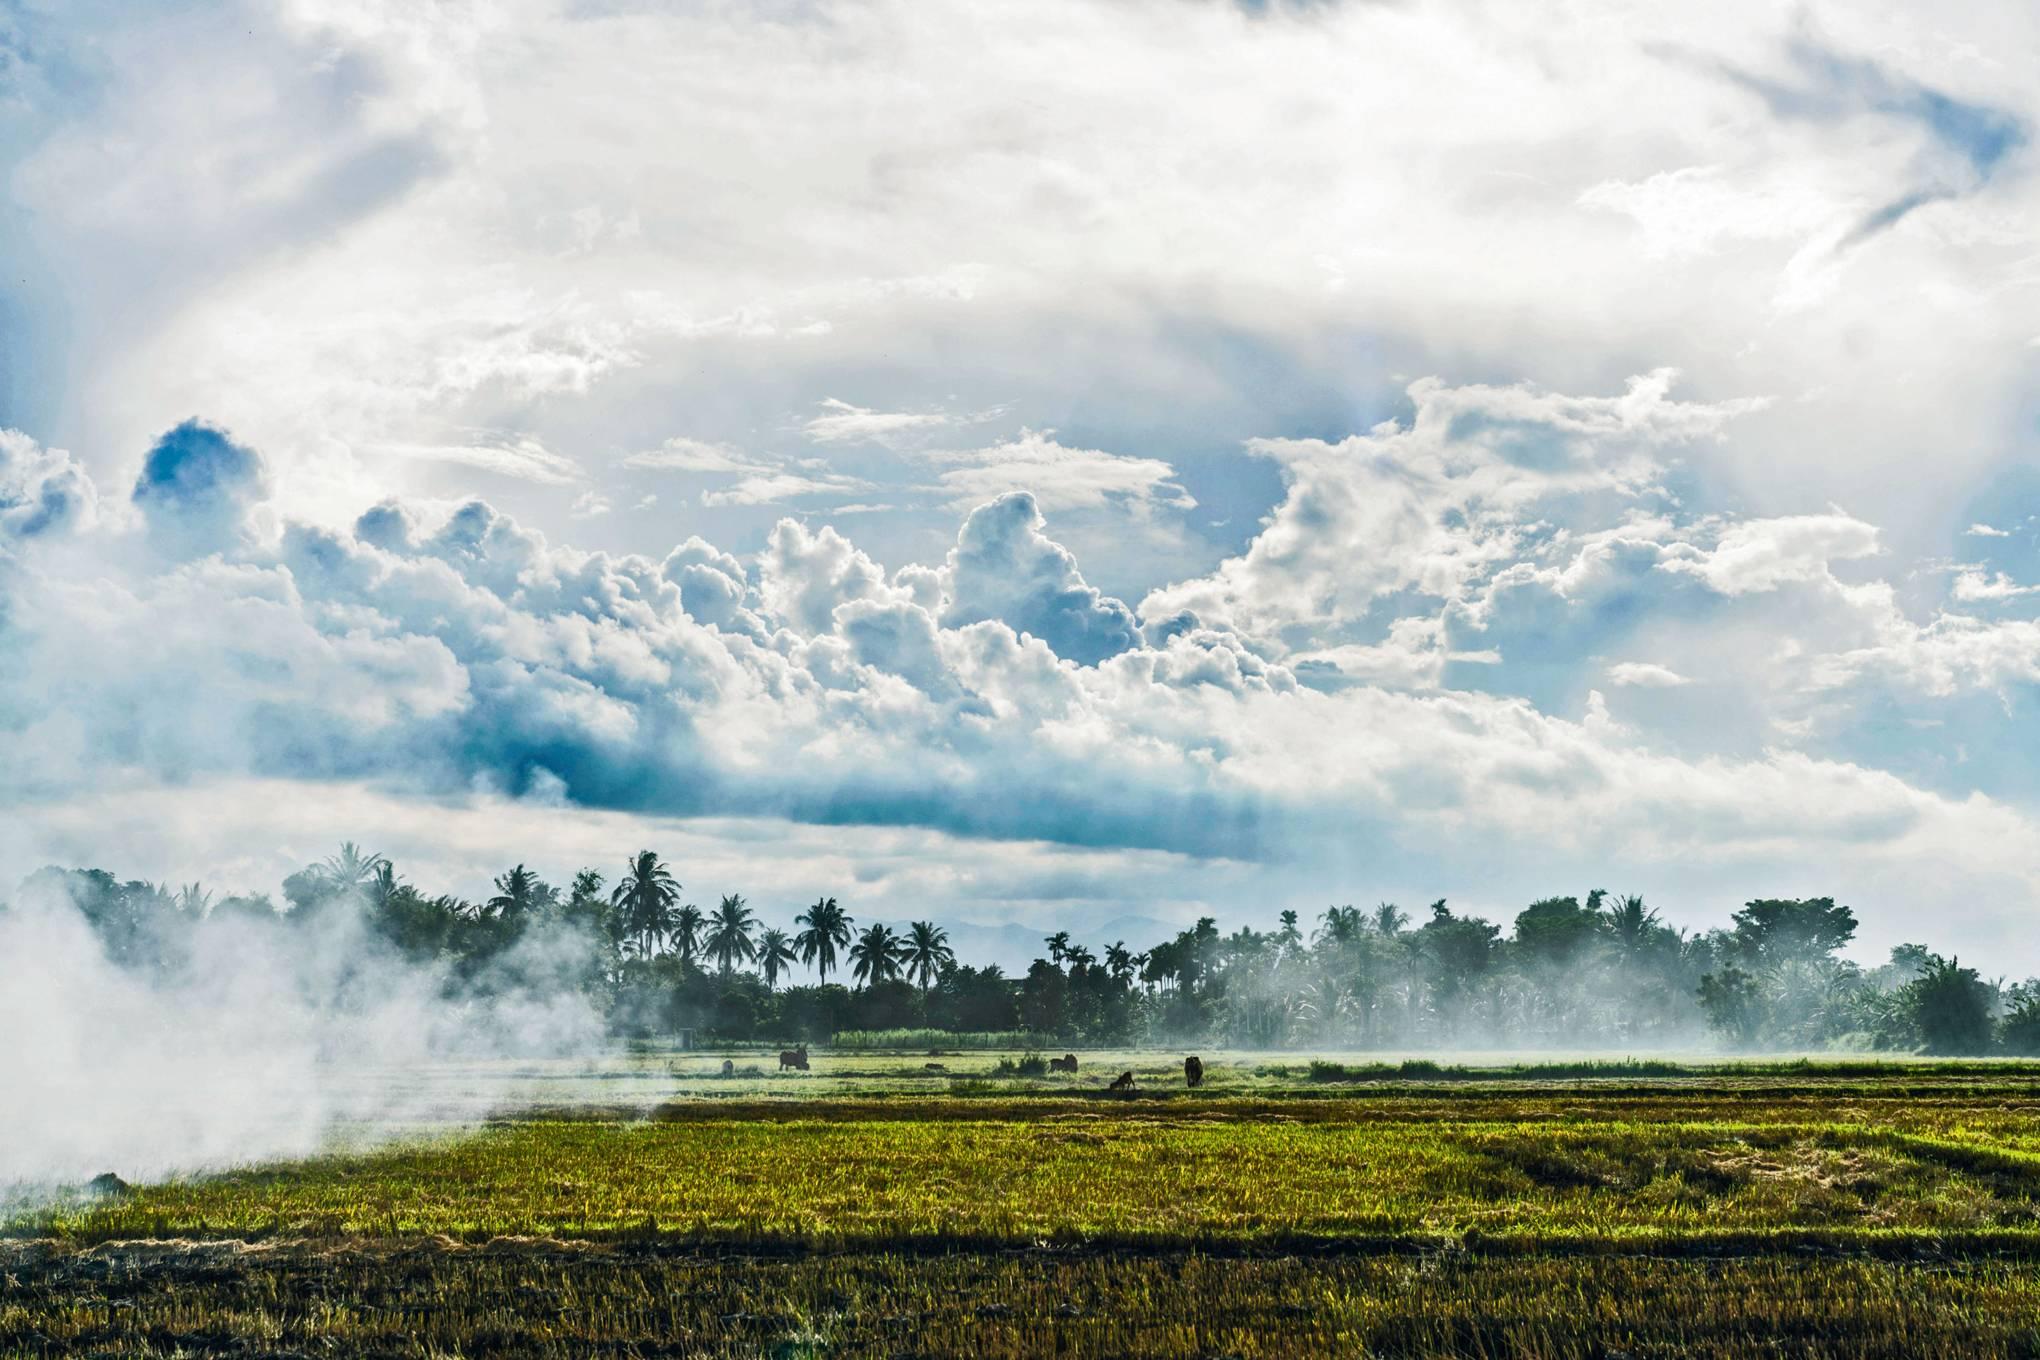 Amanoi Vietnam The Best Spas In The World 2018 Cn Traveller